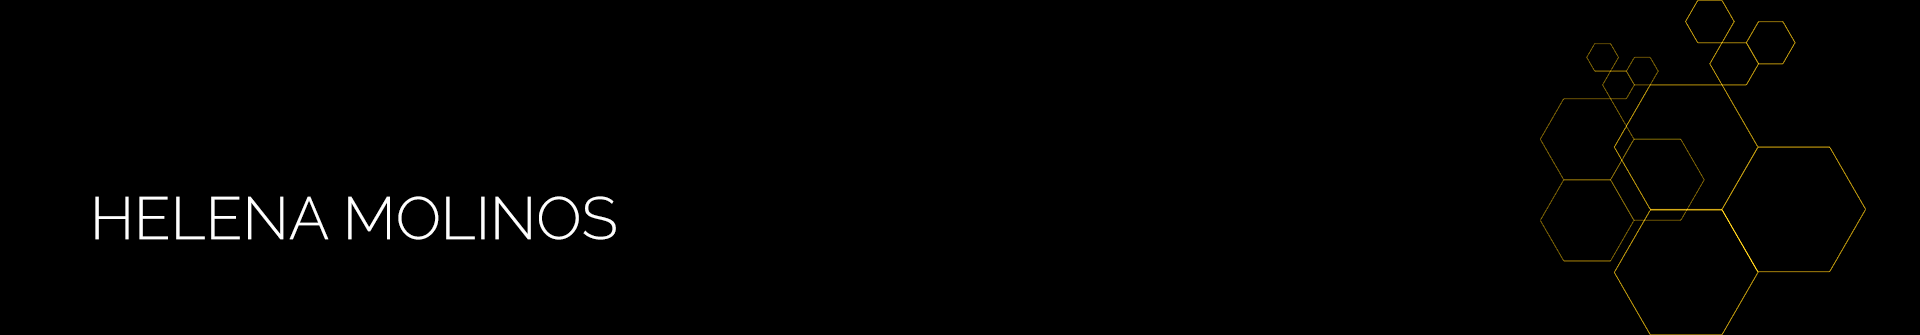 Helena molinos